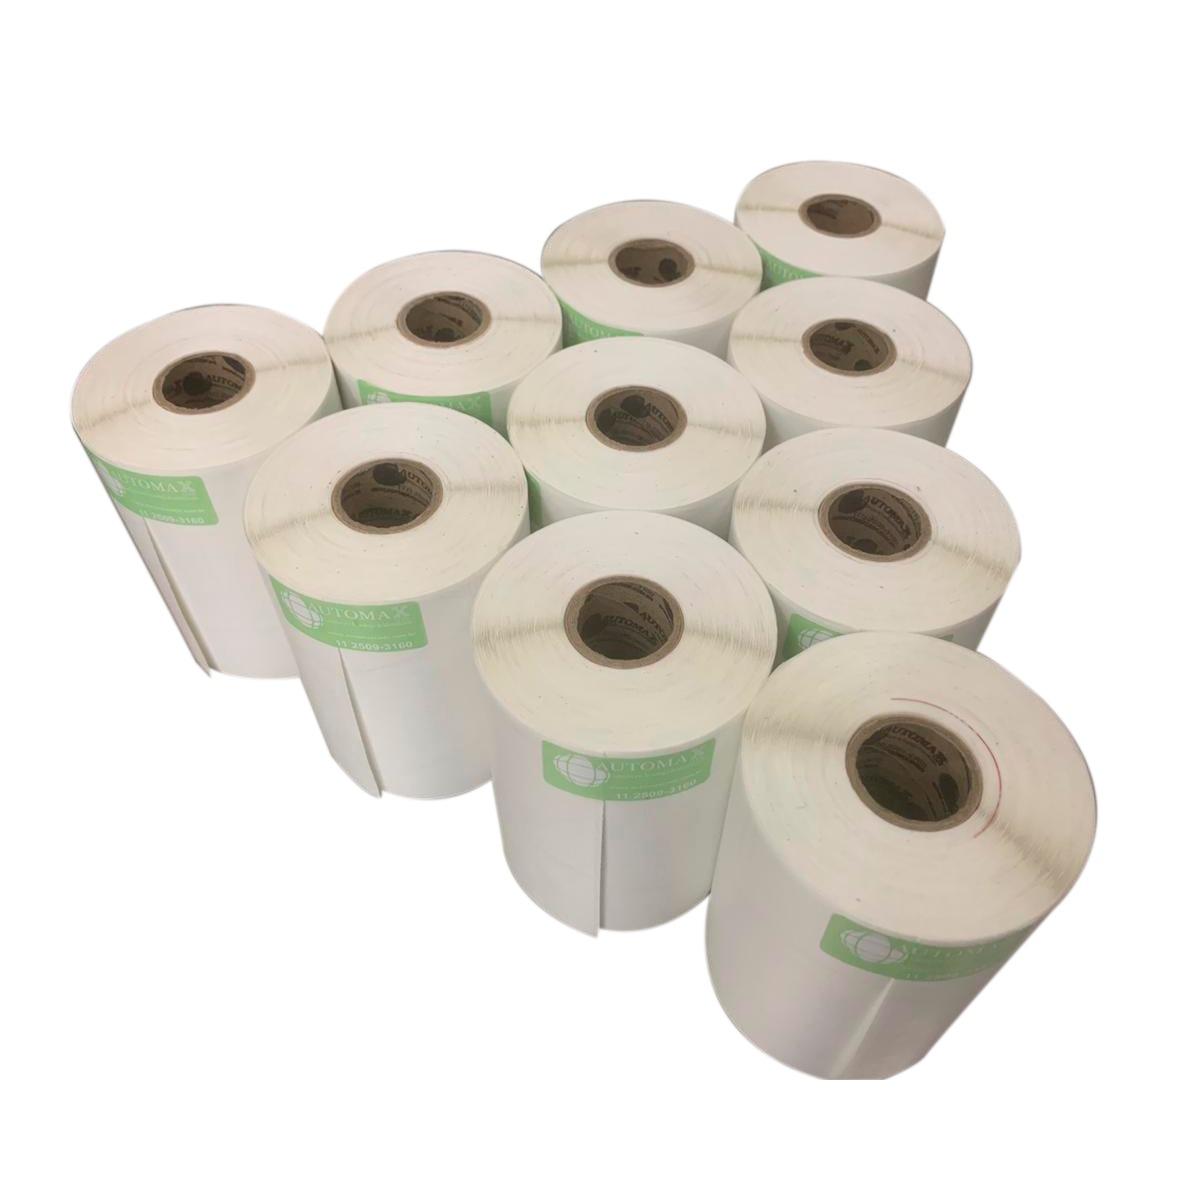 10 Rolos de Etiqueta Térmica 100x100| 100mmX100mm